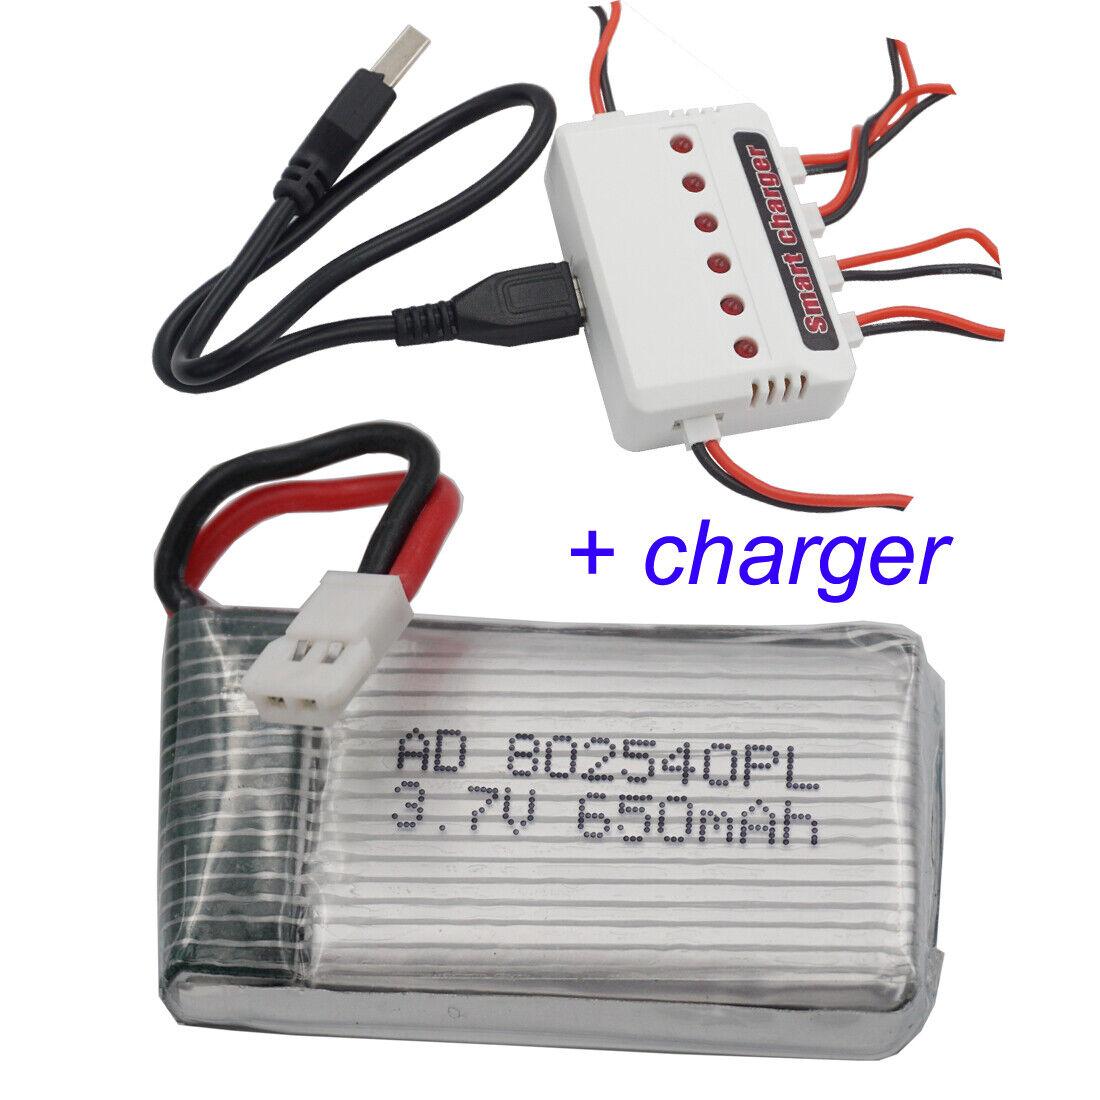 3.7V 650 mAh 25C Li-Polymer Li-Po battery for SYMA X5C X5SC X5SW RC Drone 802540